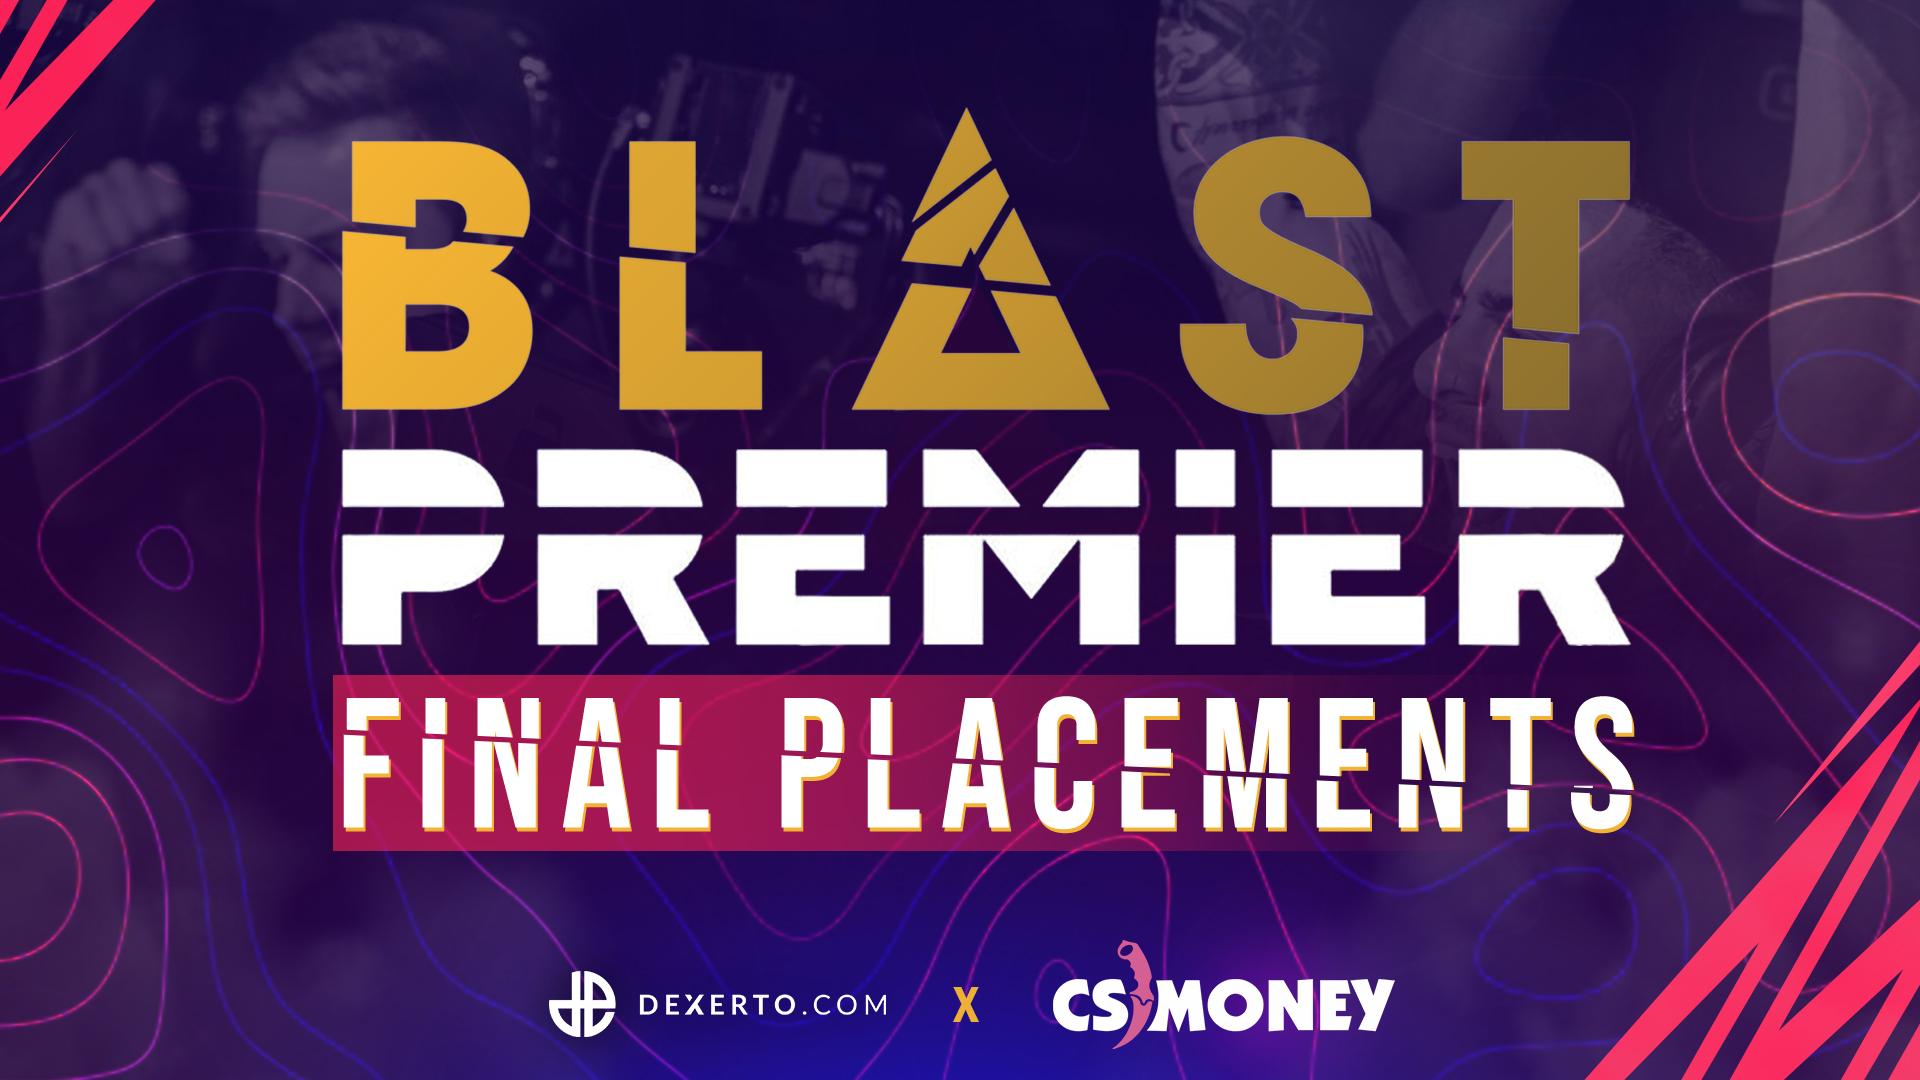 BLAST Premier Spring Finals Final Placements